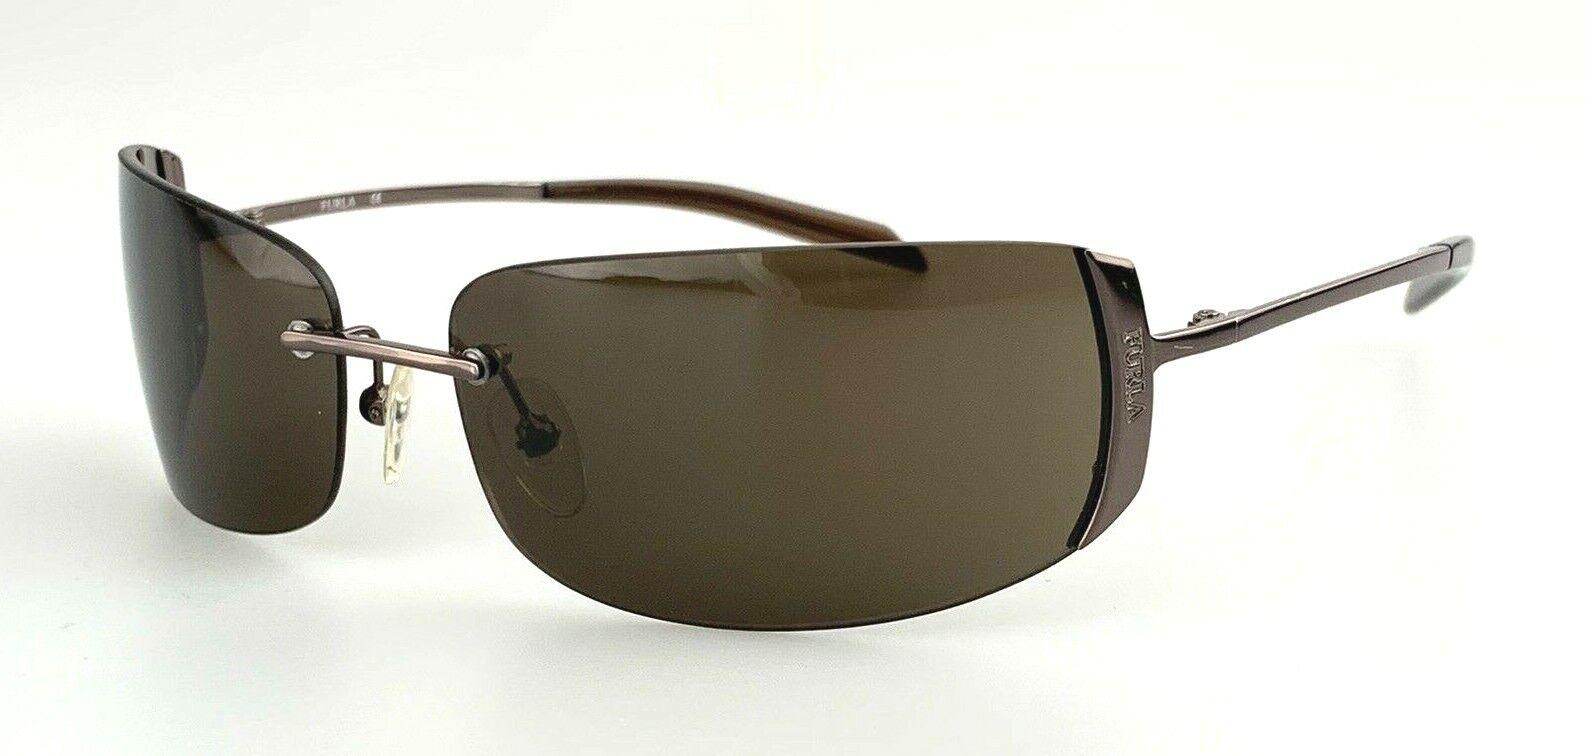 FURLA Sunglasses mod. Urban SU 4031 Col. K01 Brown Rimless 90's Vintage Italy